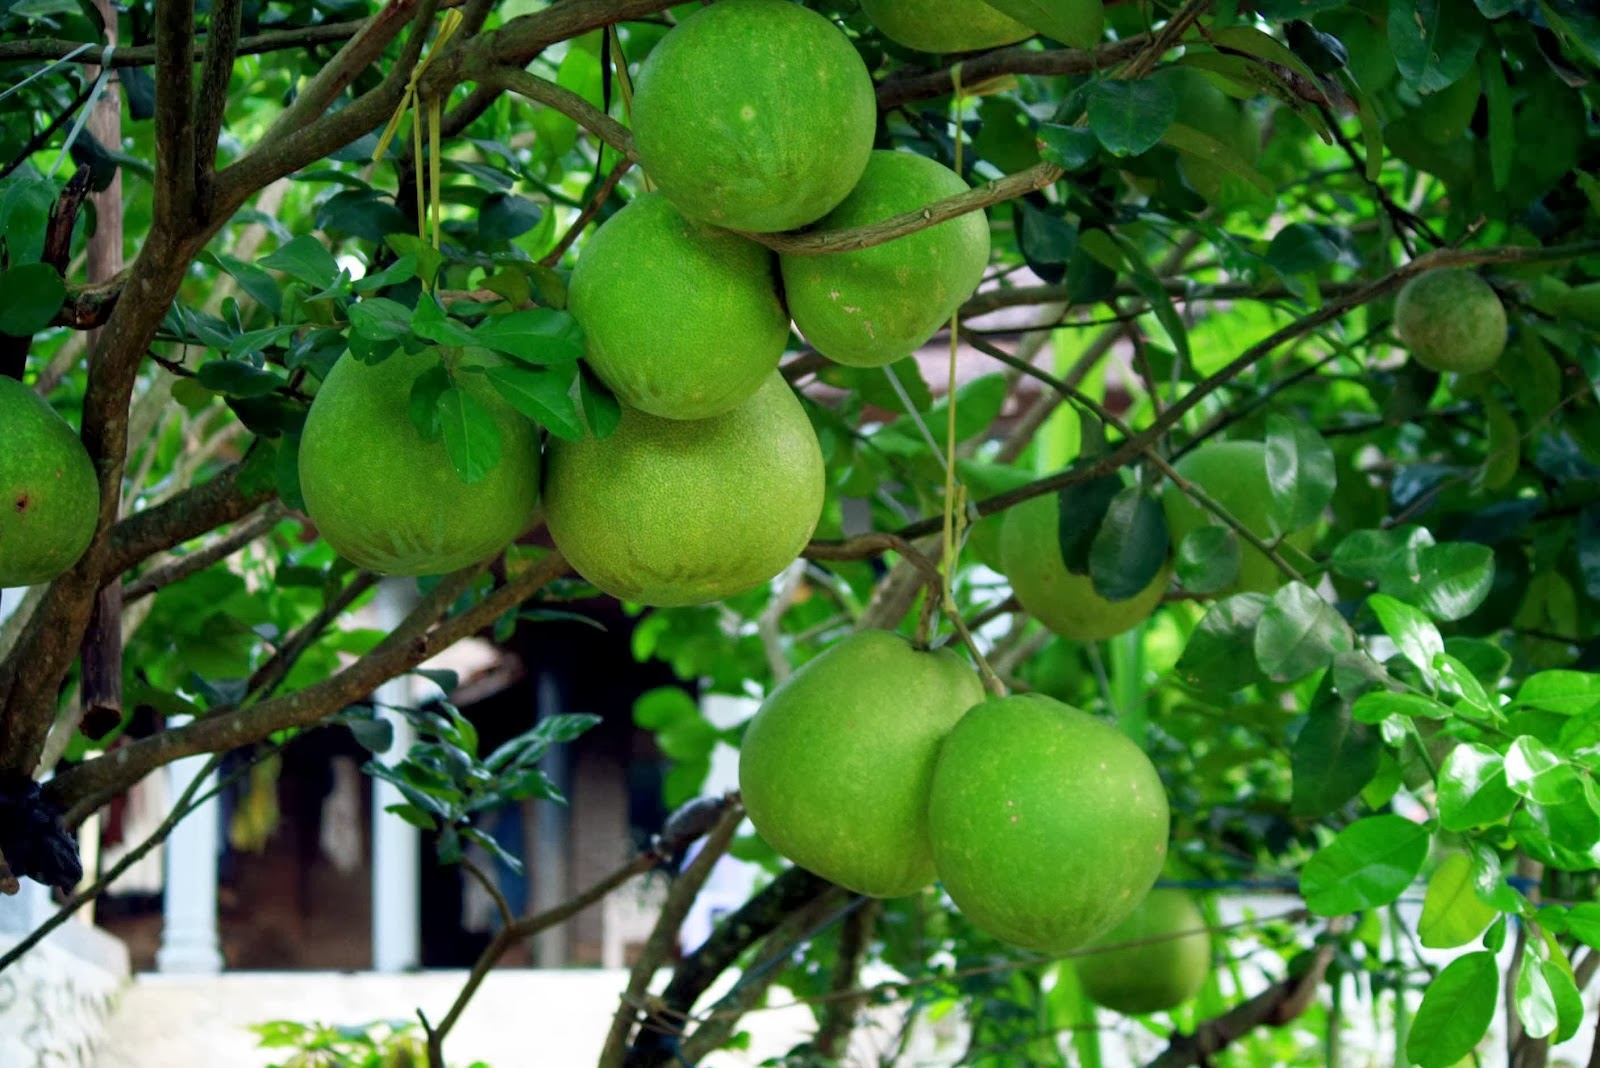 Pohon buah jeruk cangkokan  Jeruk manis, sankis, bali